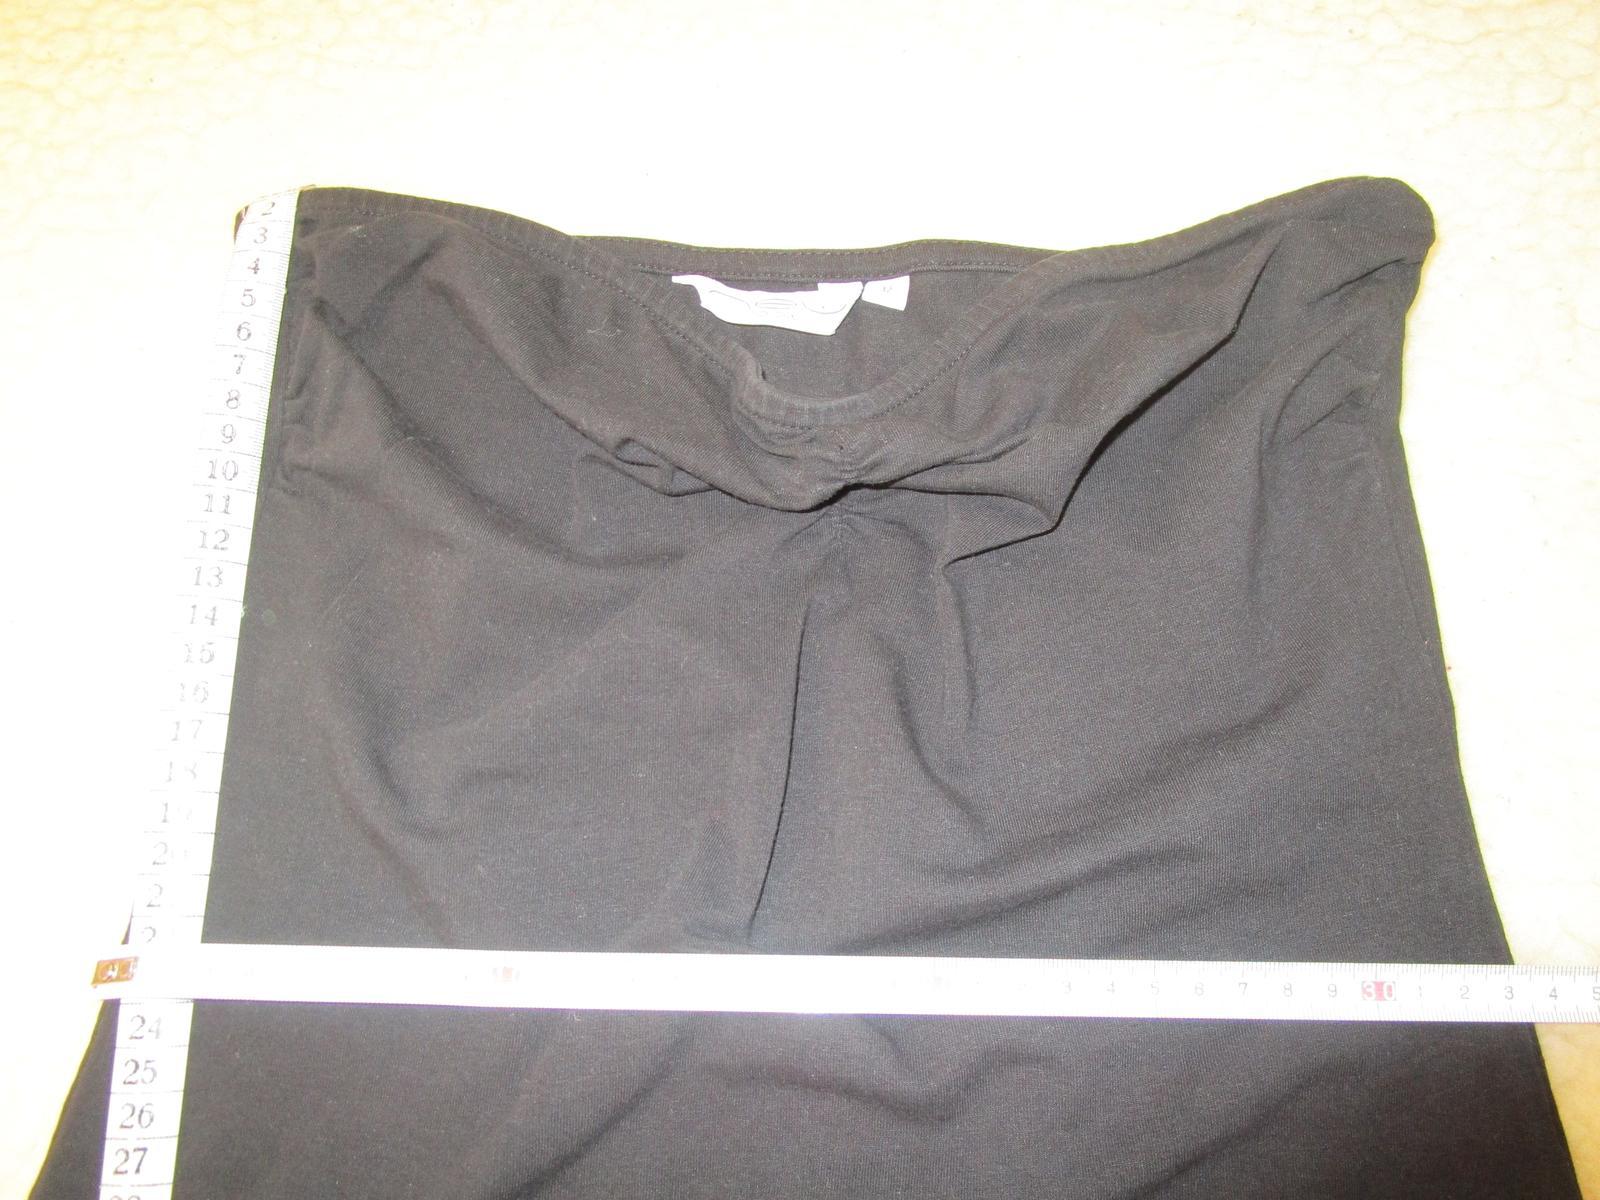 2106. Šaty - Obrázok č. 2